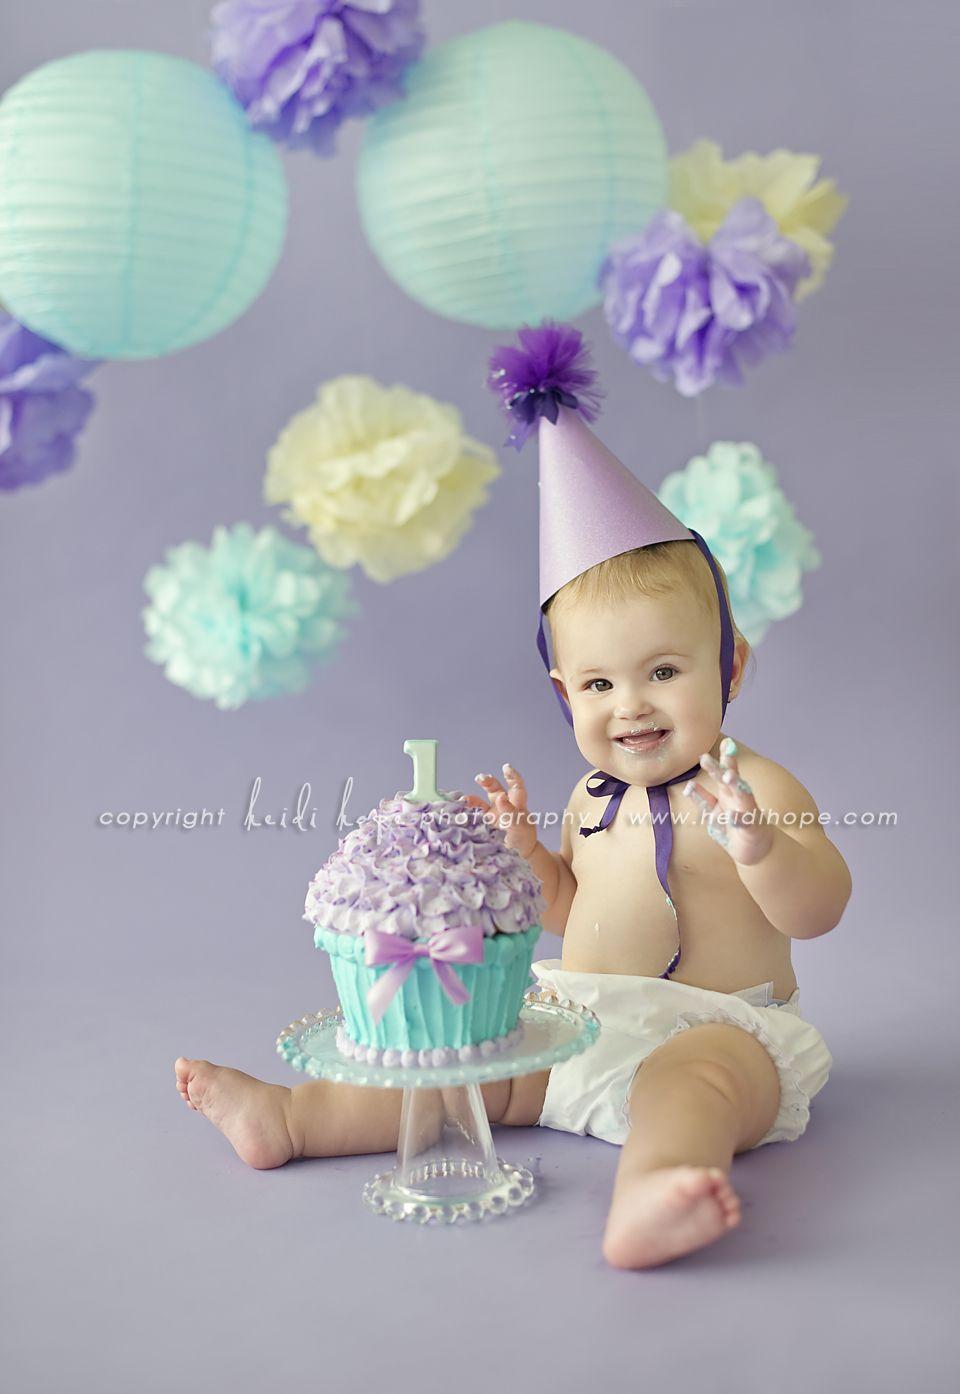 happy first birthday baby k central massachusetts cake smash on images baby eating birthday cake